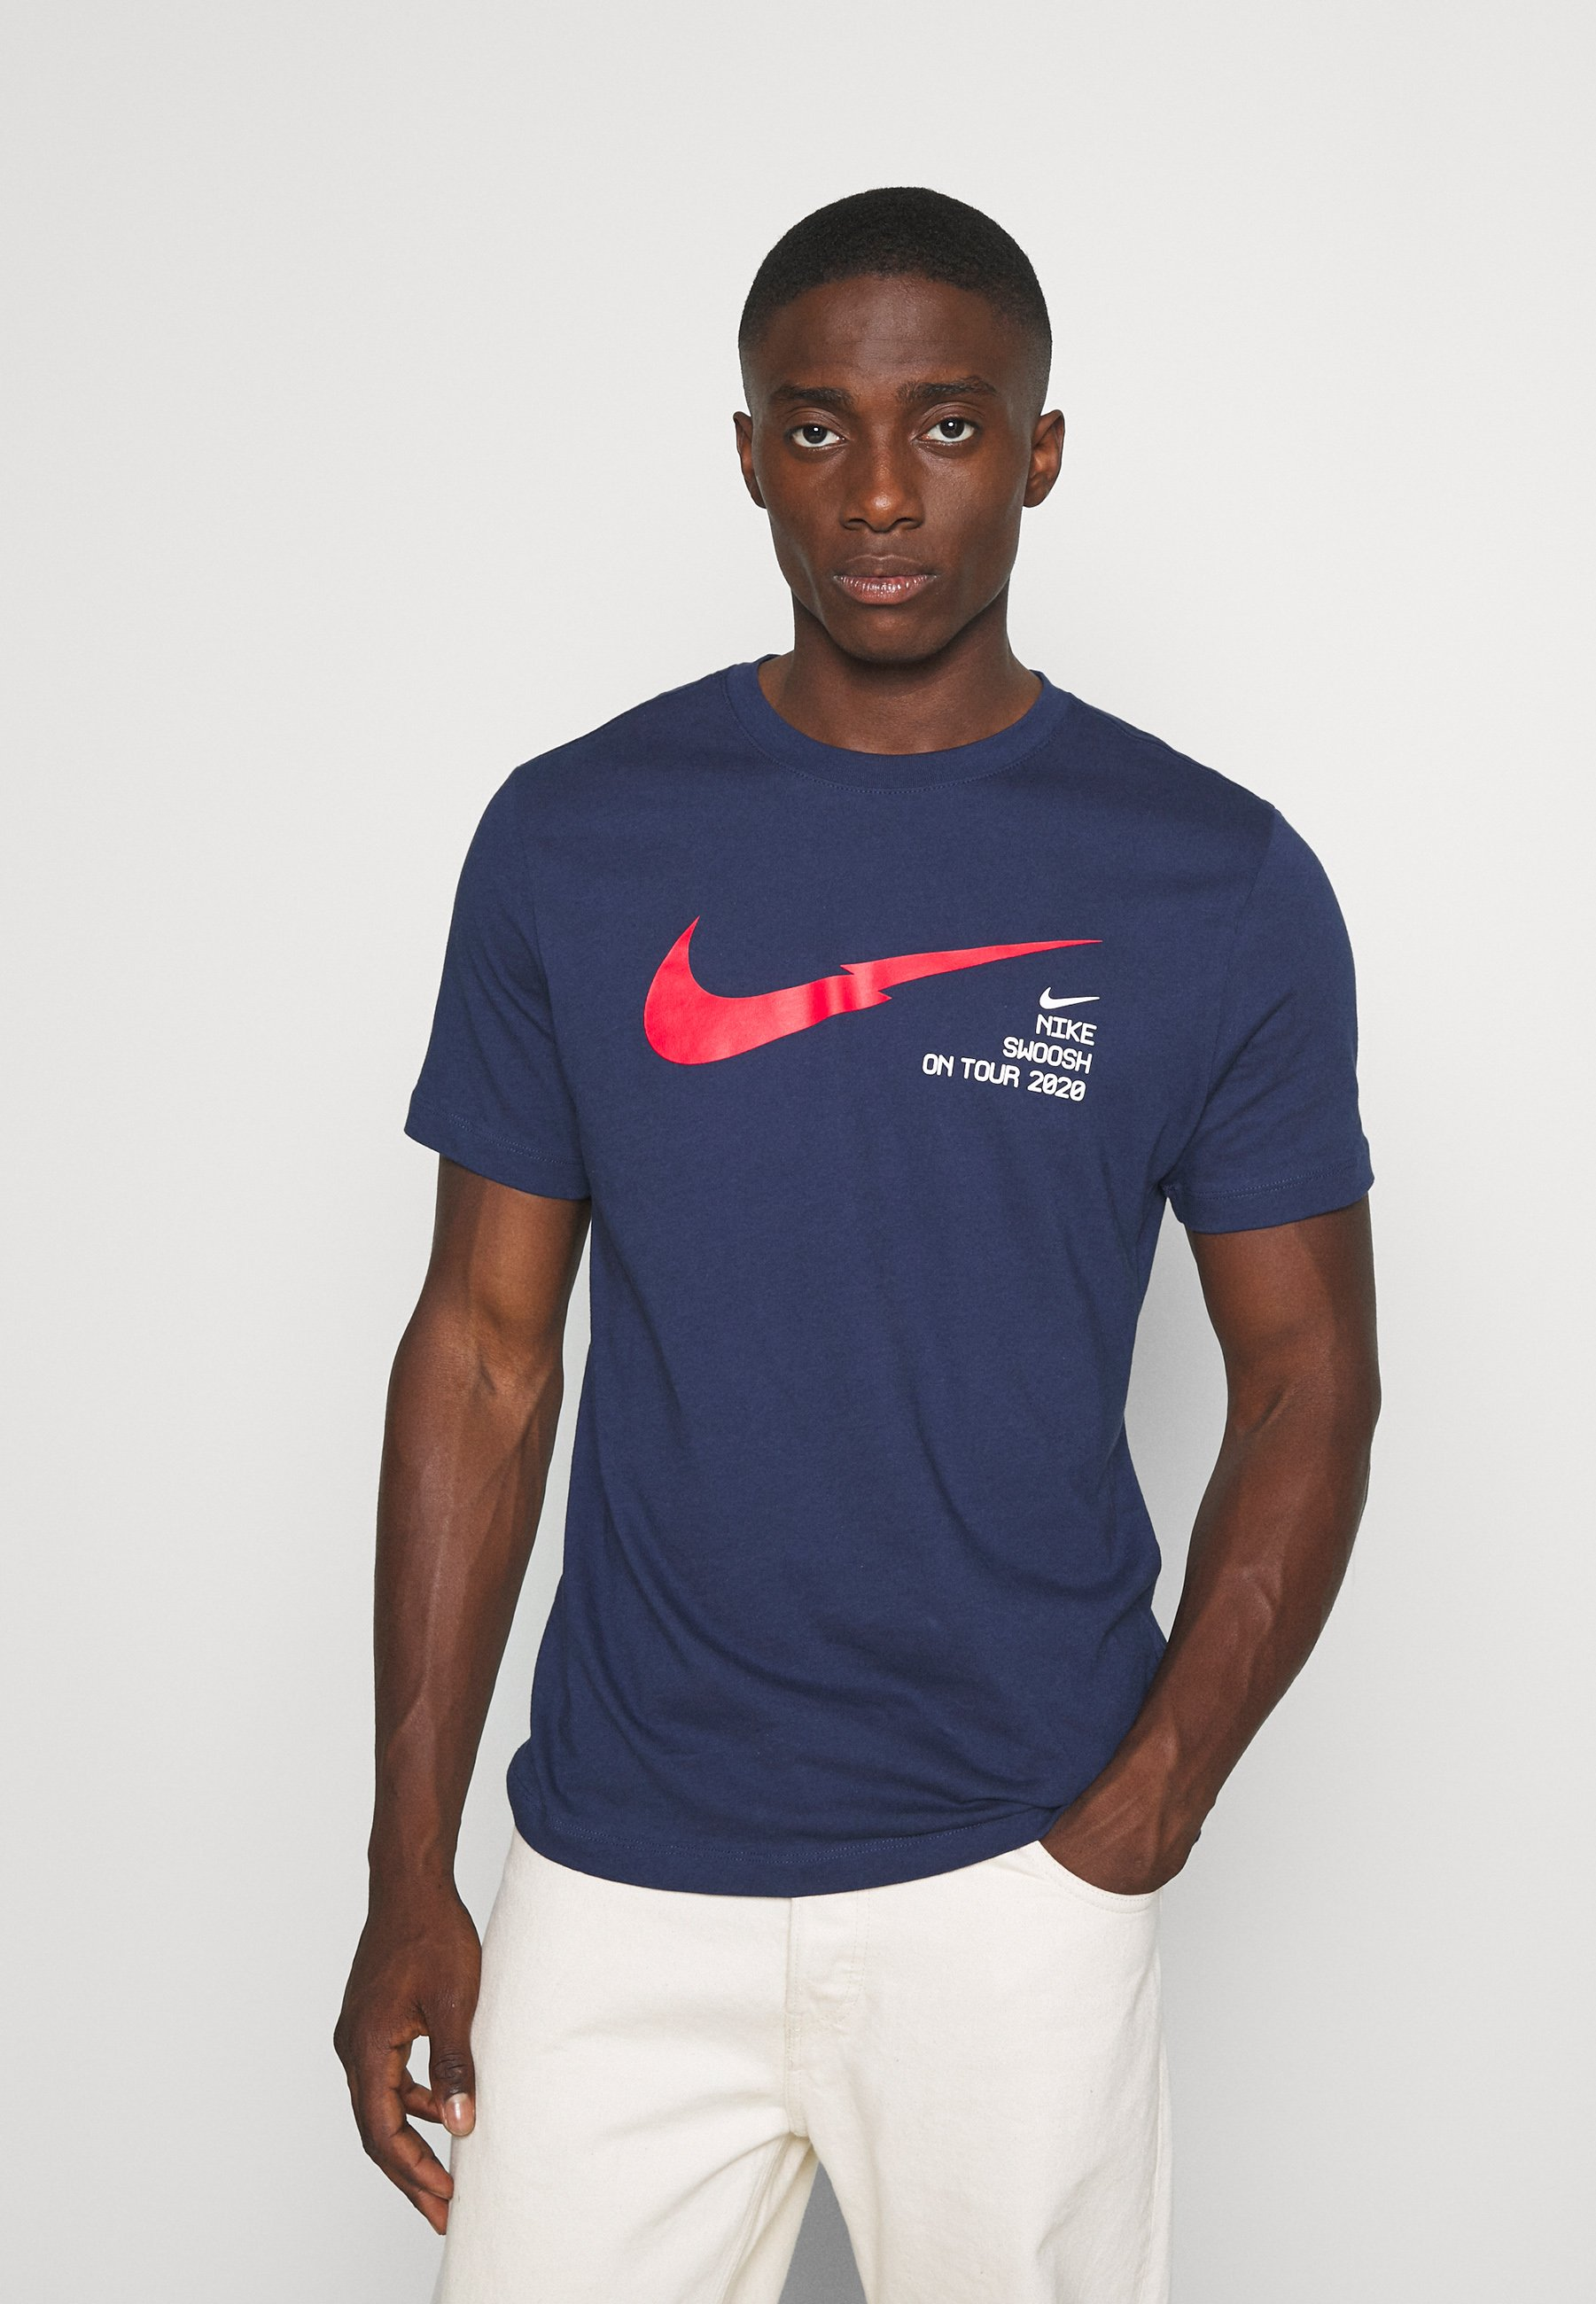 extremadamente mundo microscópico  Nike Sportswear Camiseta estampada - midnight navy/azul marino - Zalando.es